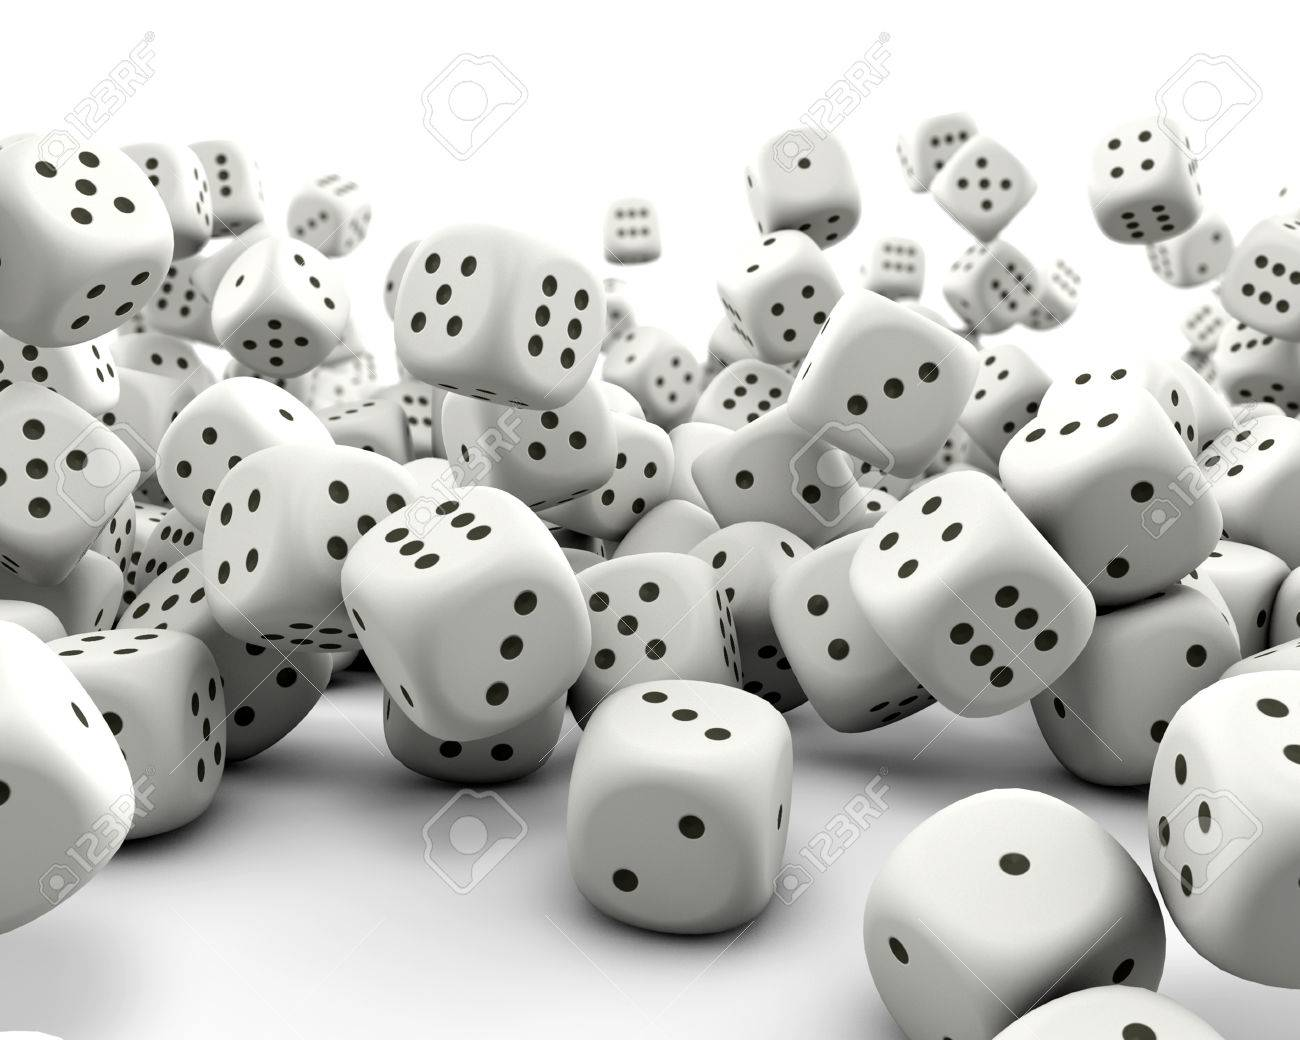 Falling gaming dice Stock Photo - 37701988